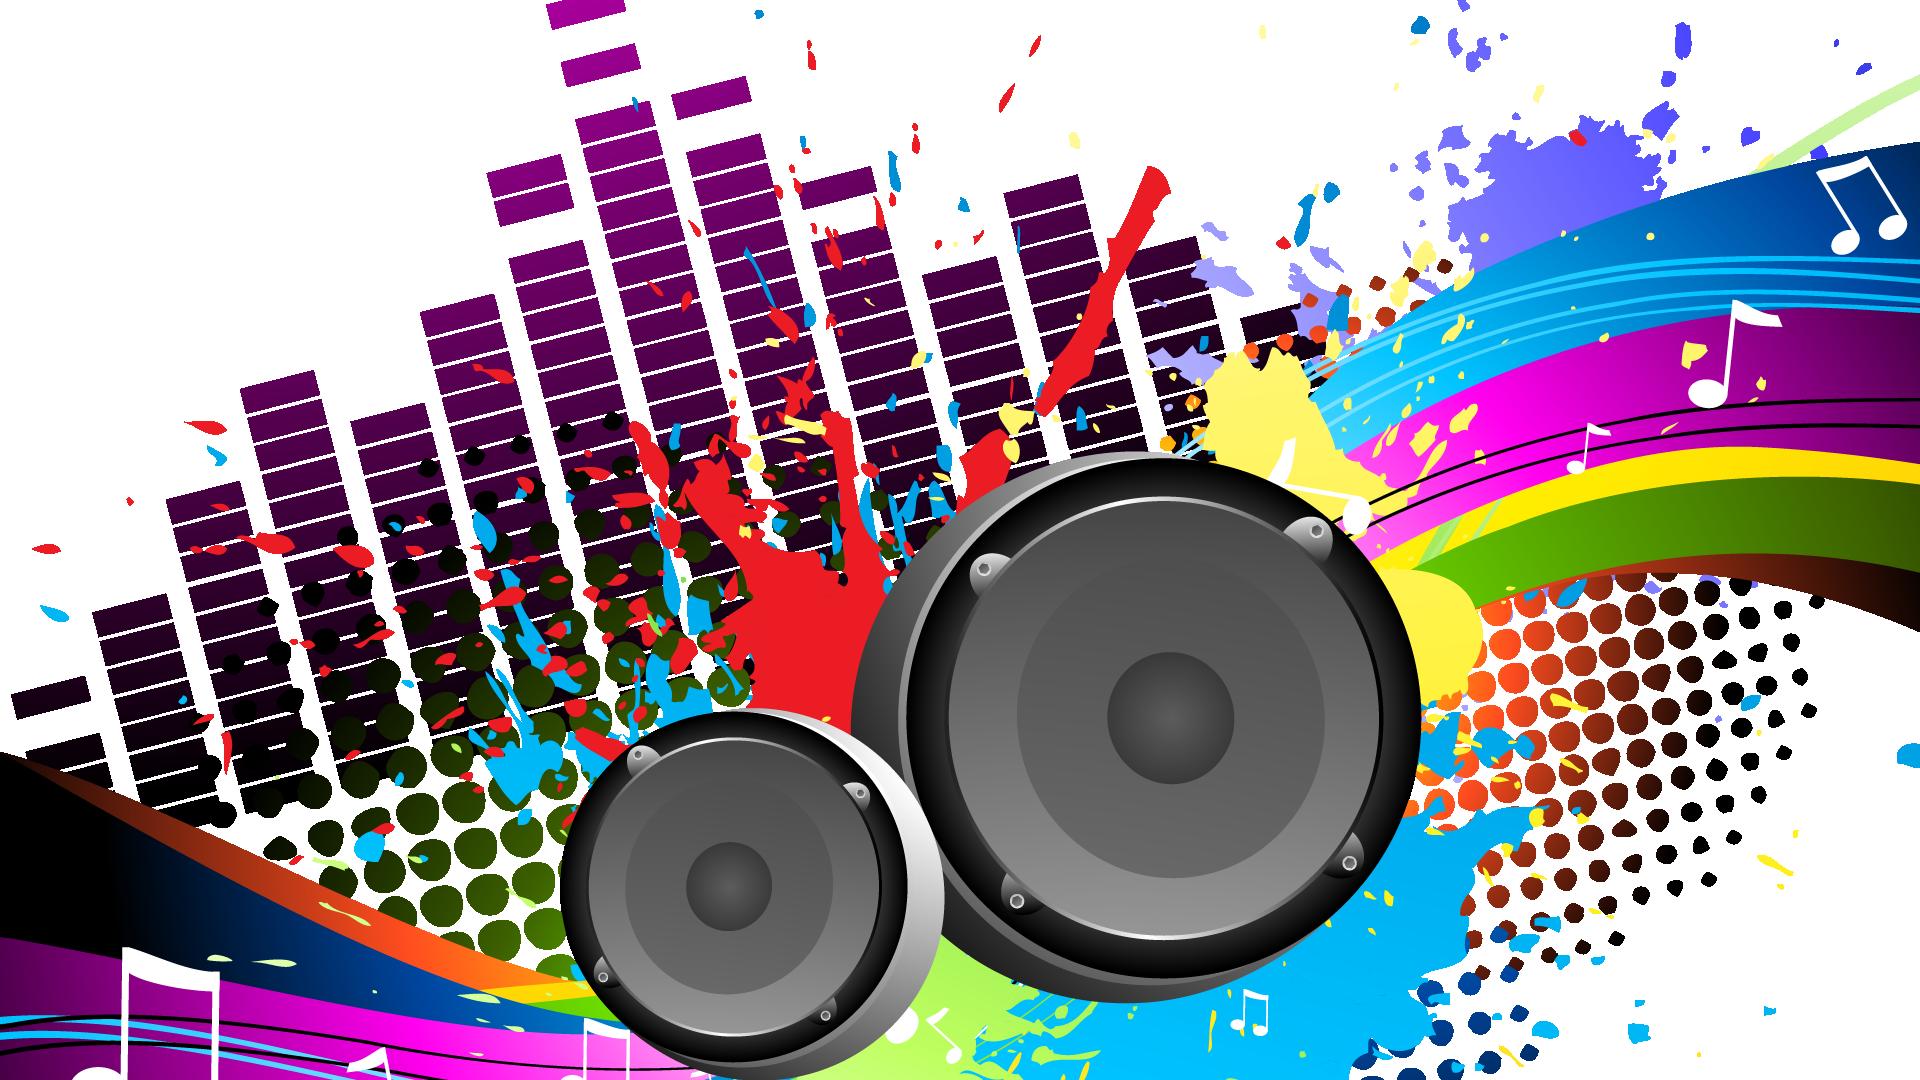 Transparent pluspng pluspngcom musicpng. Music png images